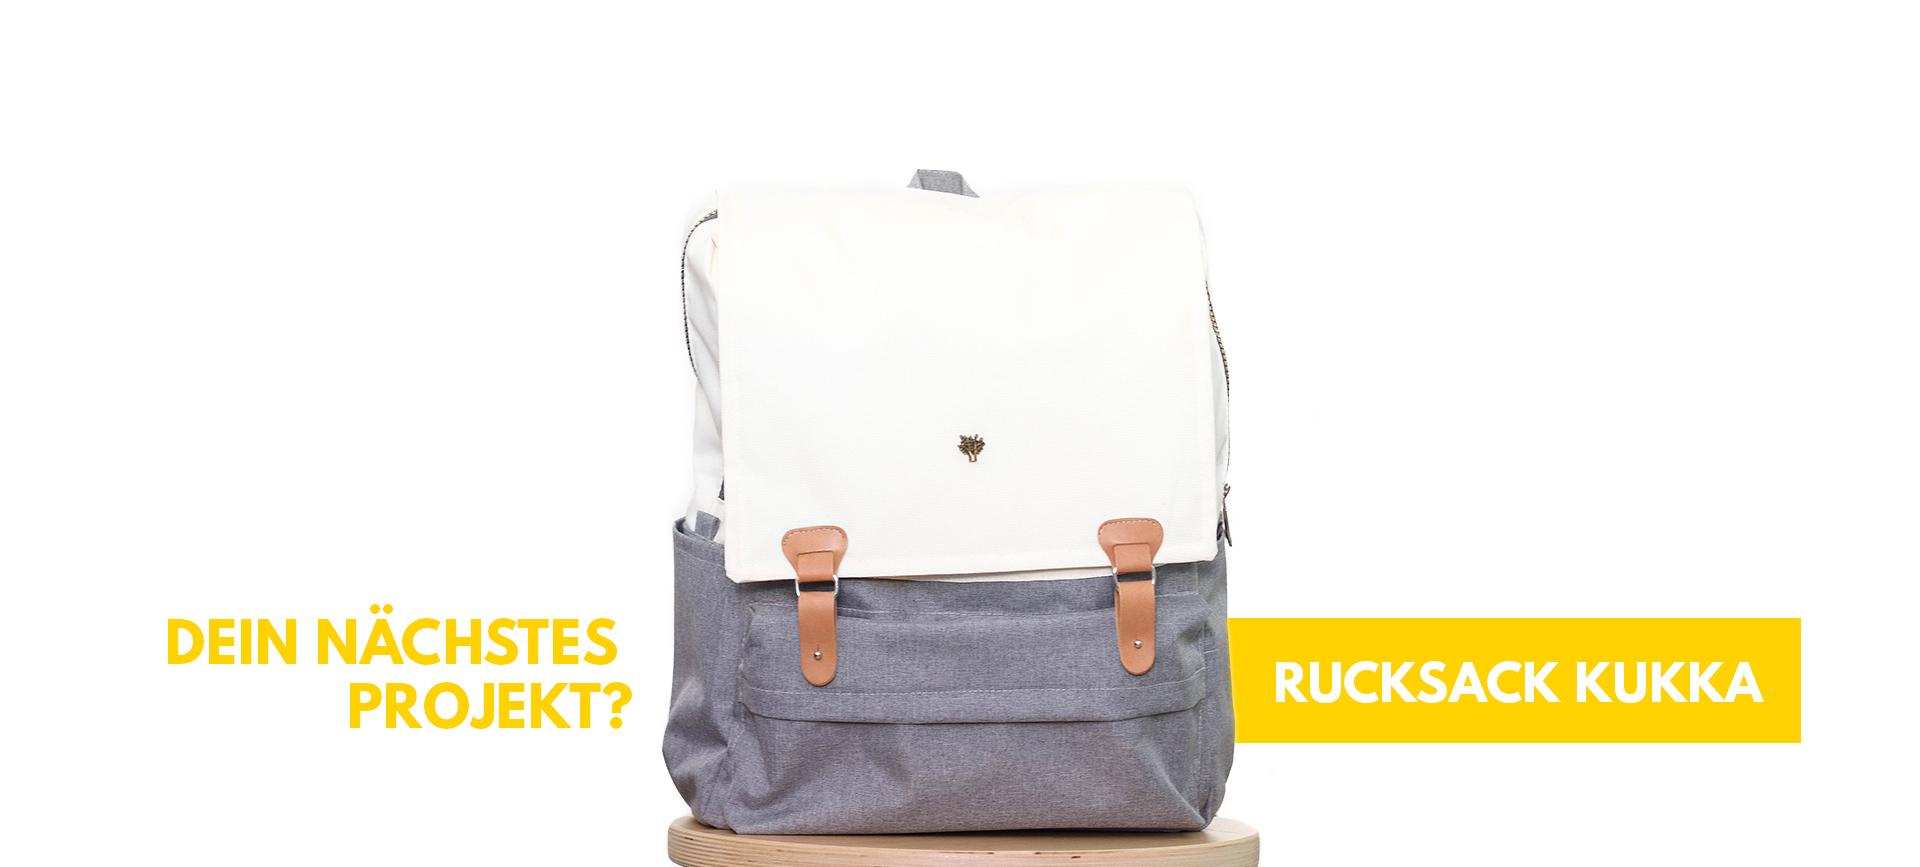 Rucksack Kukka